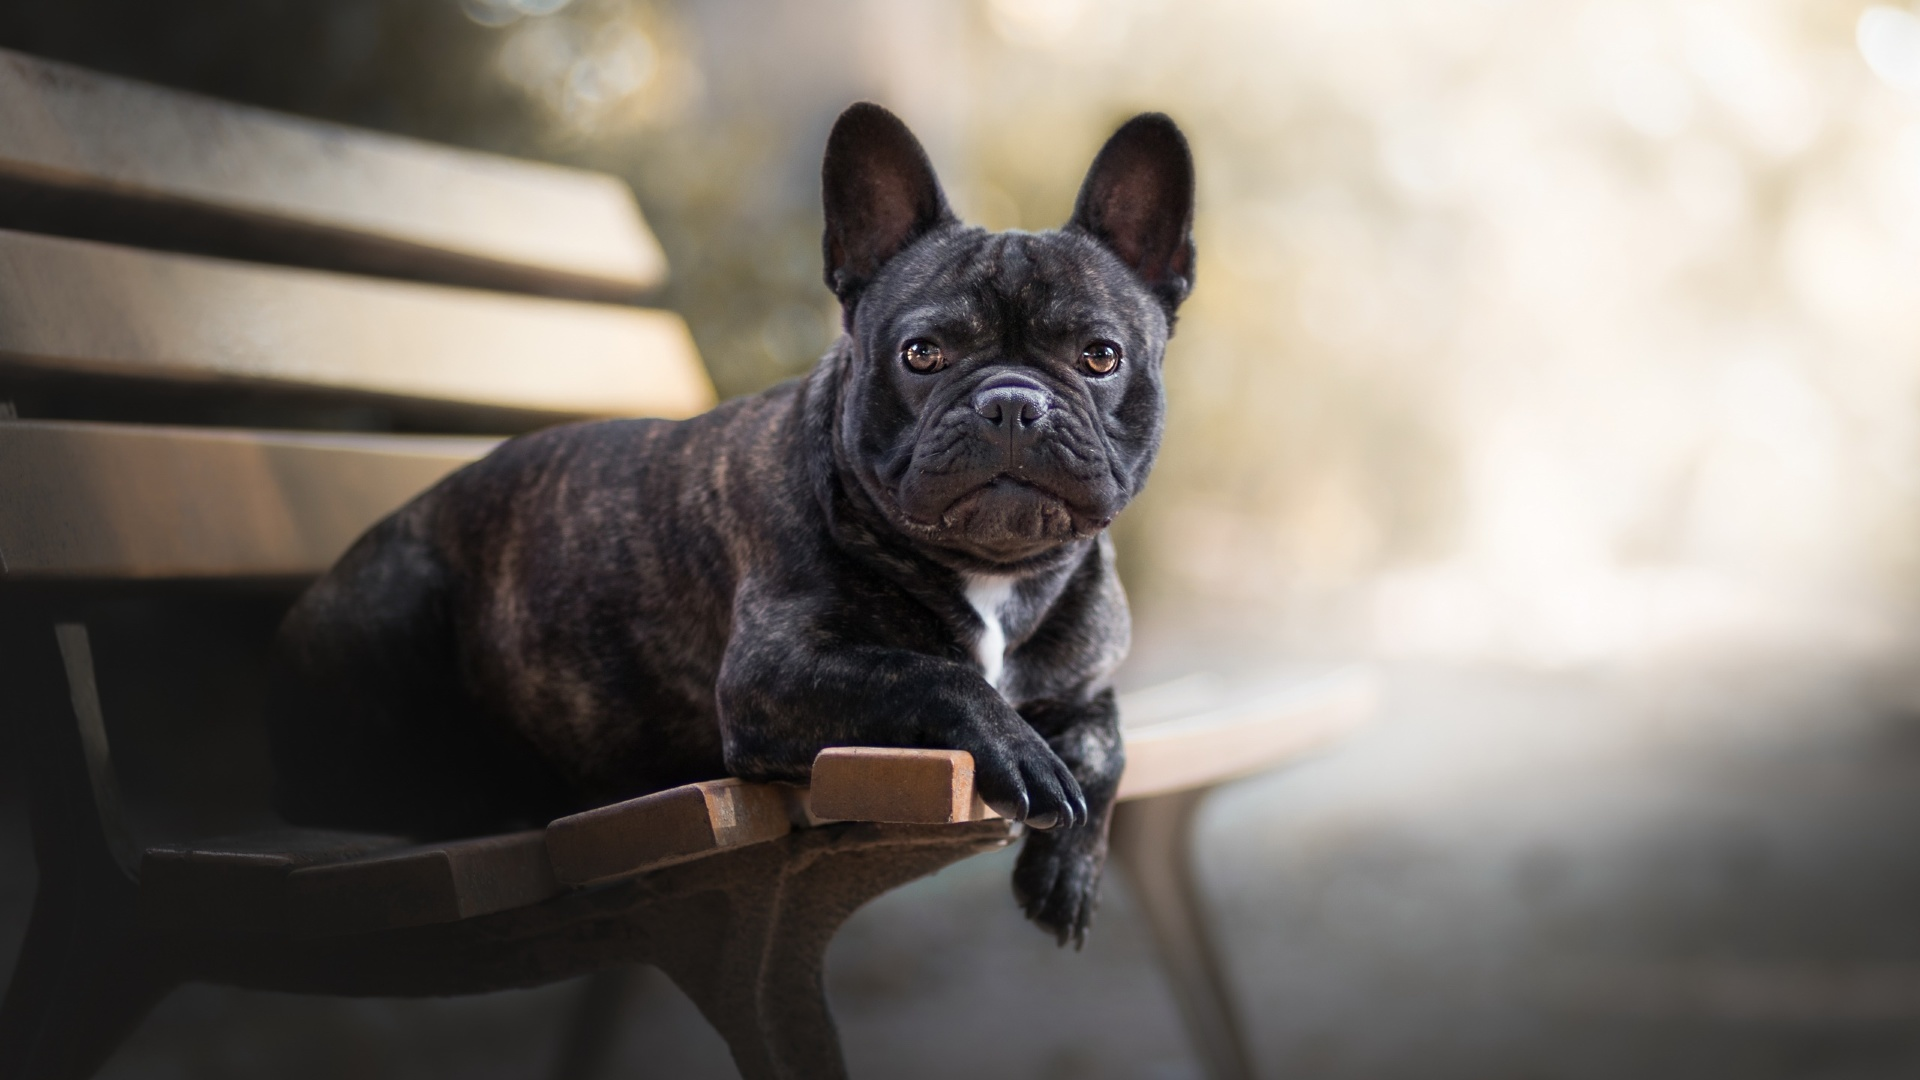 8k Animal Wallpaper Download: French Bulldog, Full HD 2K Wallpaper